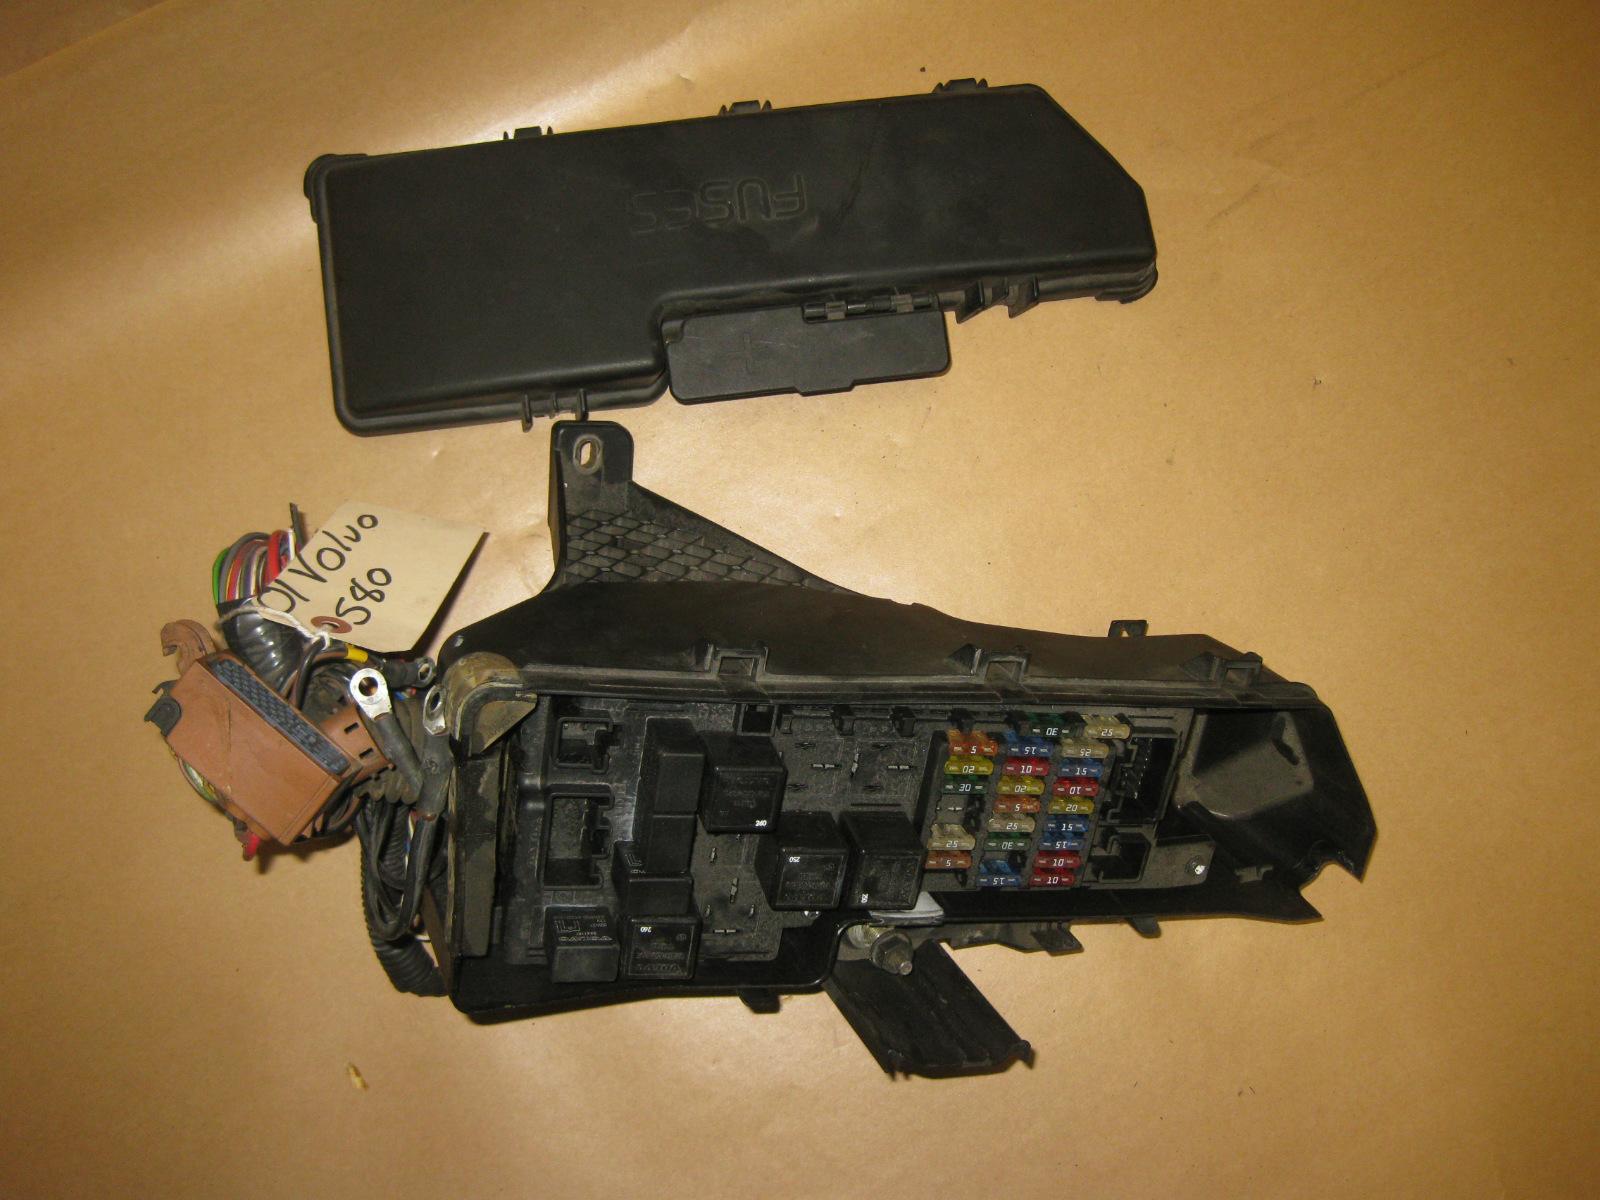 99 00 01 02 03 volvo s80 oem under hood fuse box w/ fuses part